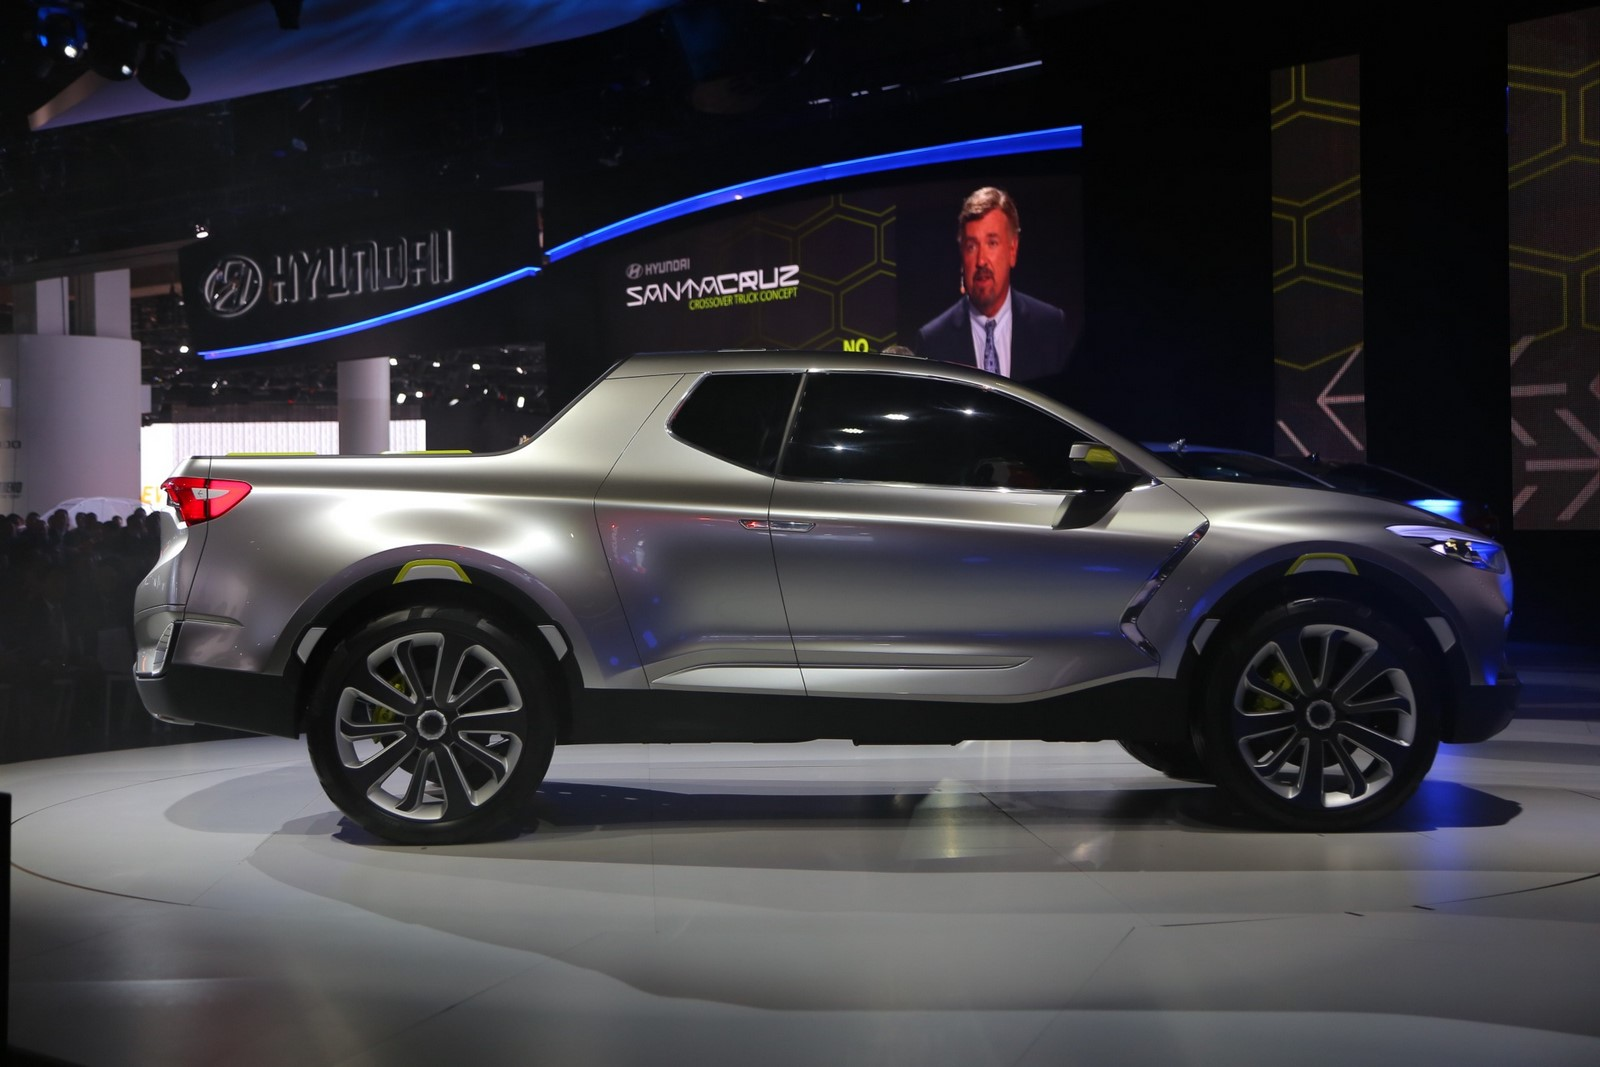 Hyundai Santa Cruz Crossover Truck Concept Aimed At Urban